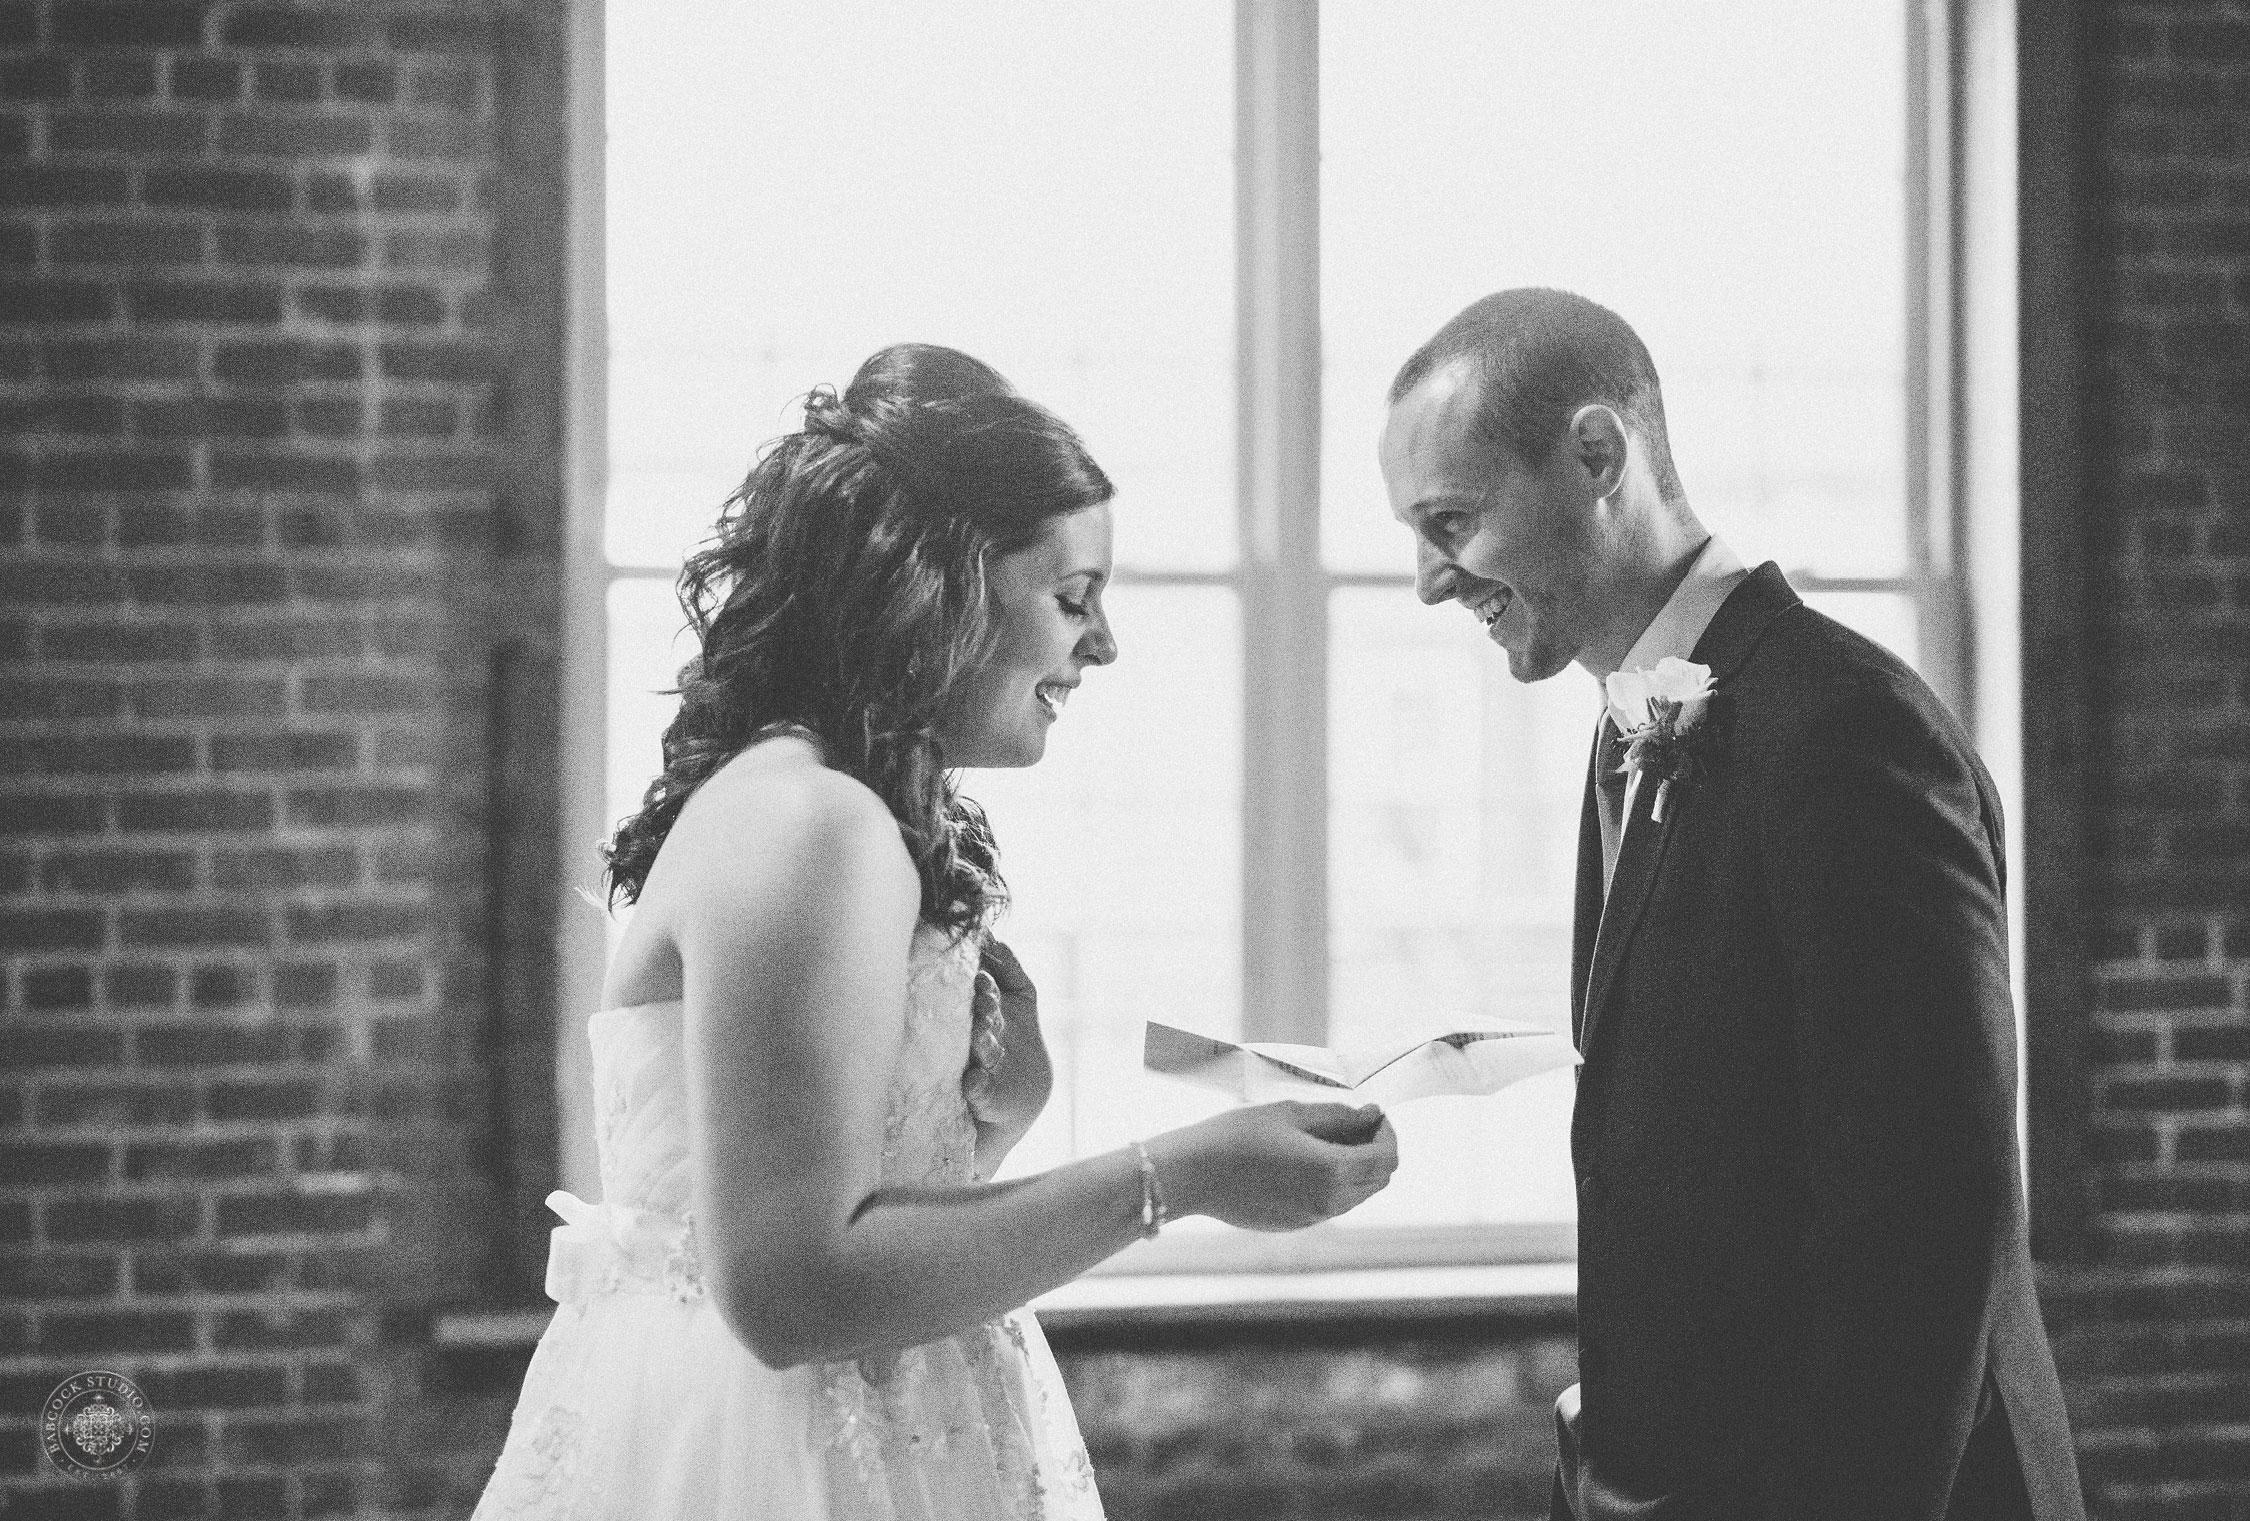 erica-nick-wedding-photographer-dayton-ohio-4.jpg